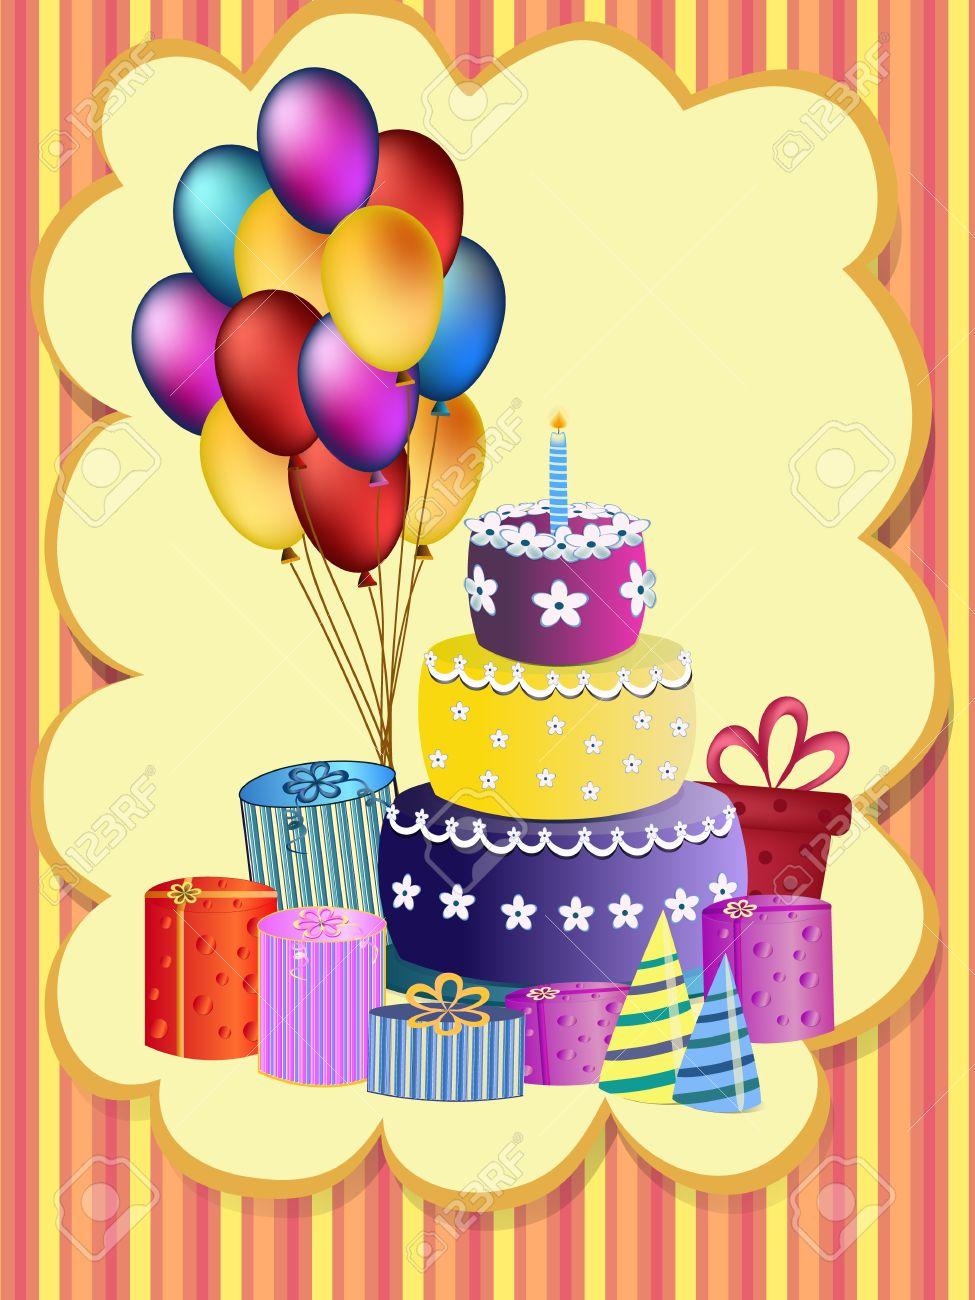 Happy Birthday Cake Balloon And Present Illustration Royalty Free